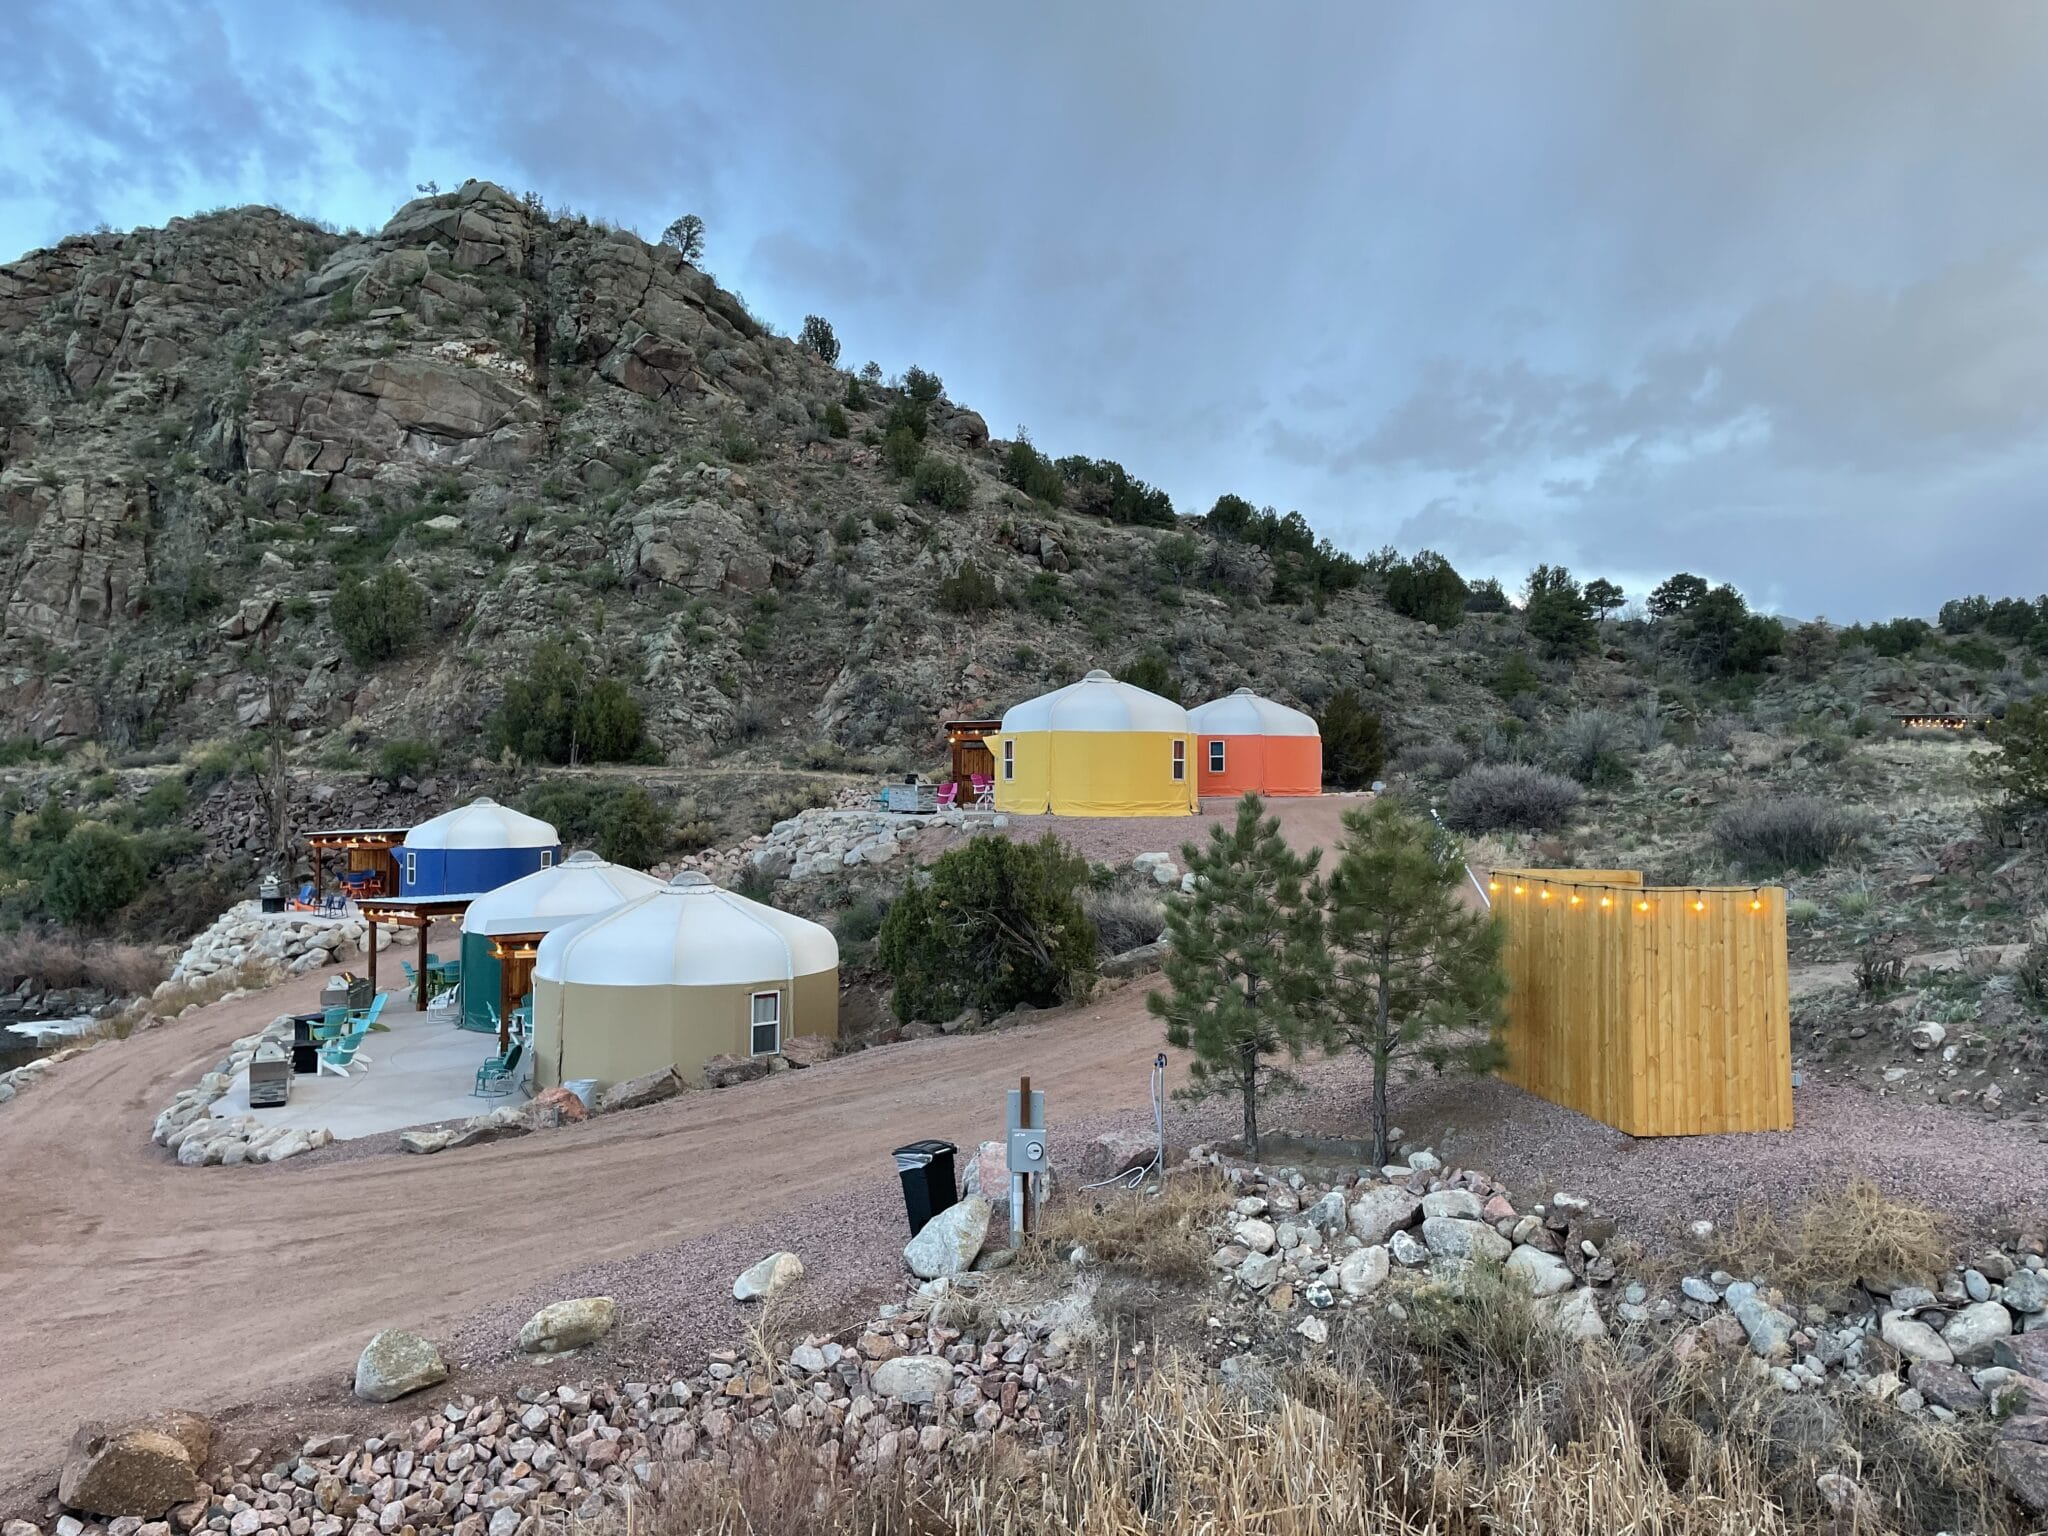 gambar yurt glamping